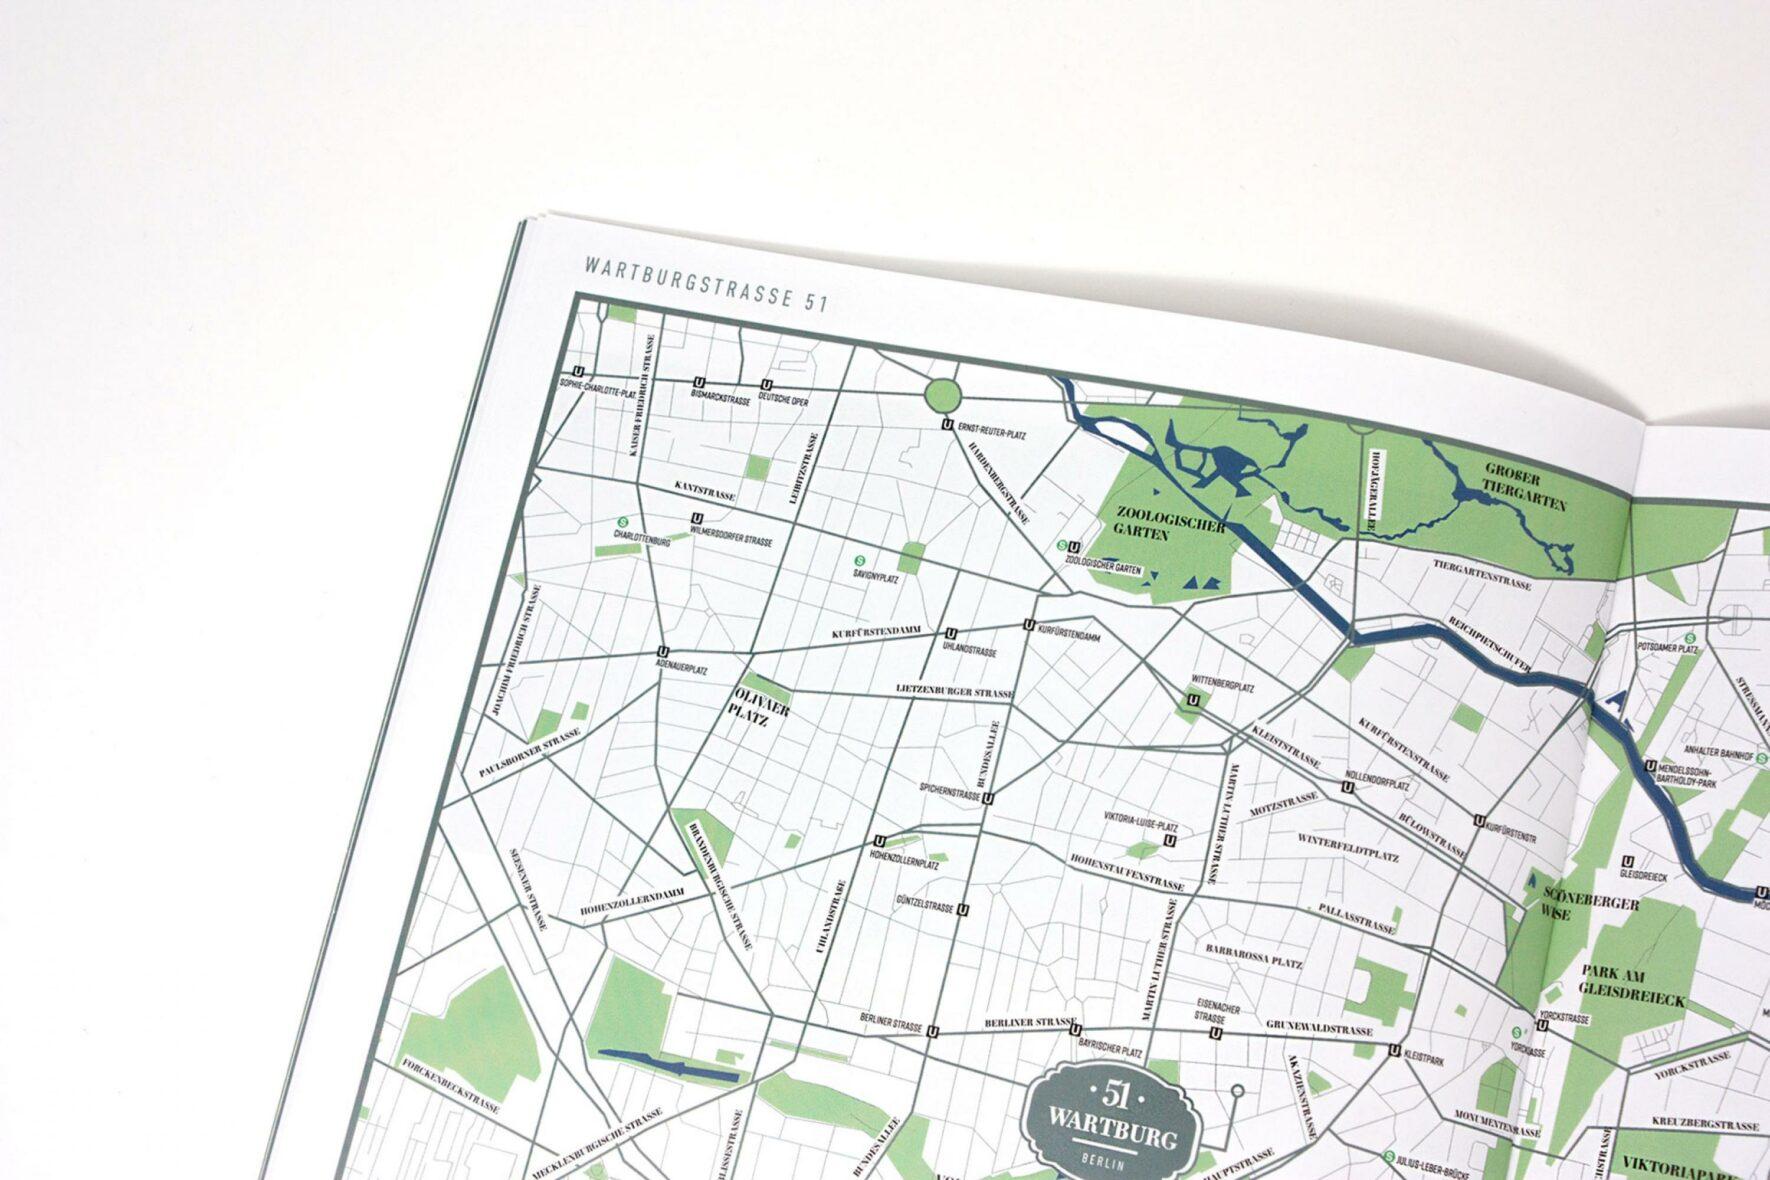 Immobilienbranding-wartburg-Trendcity-Broschüre-FORMLOS-berlin_MG_8310